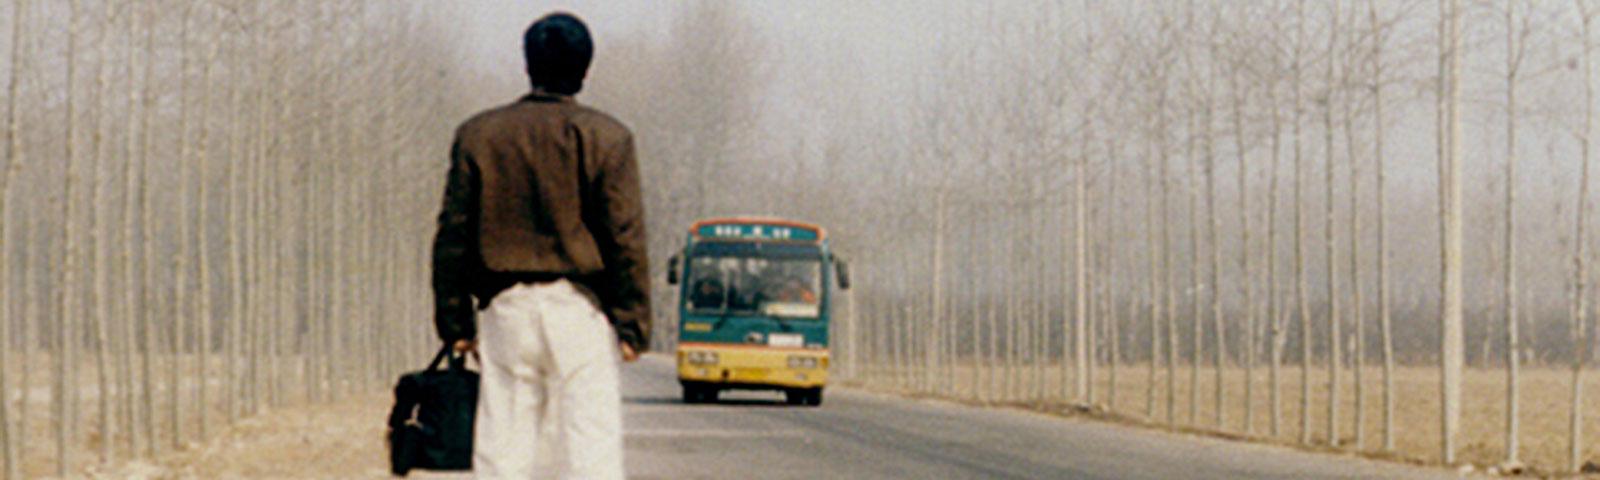 bus hijack essay